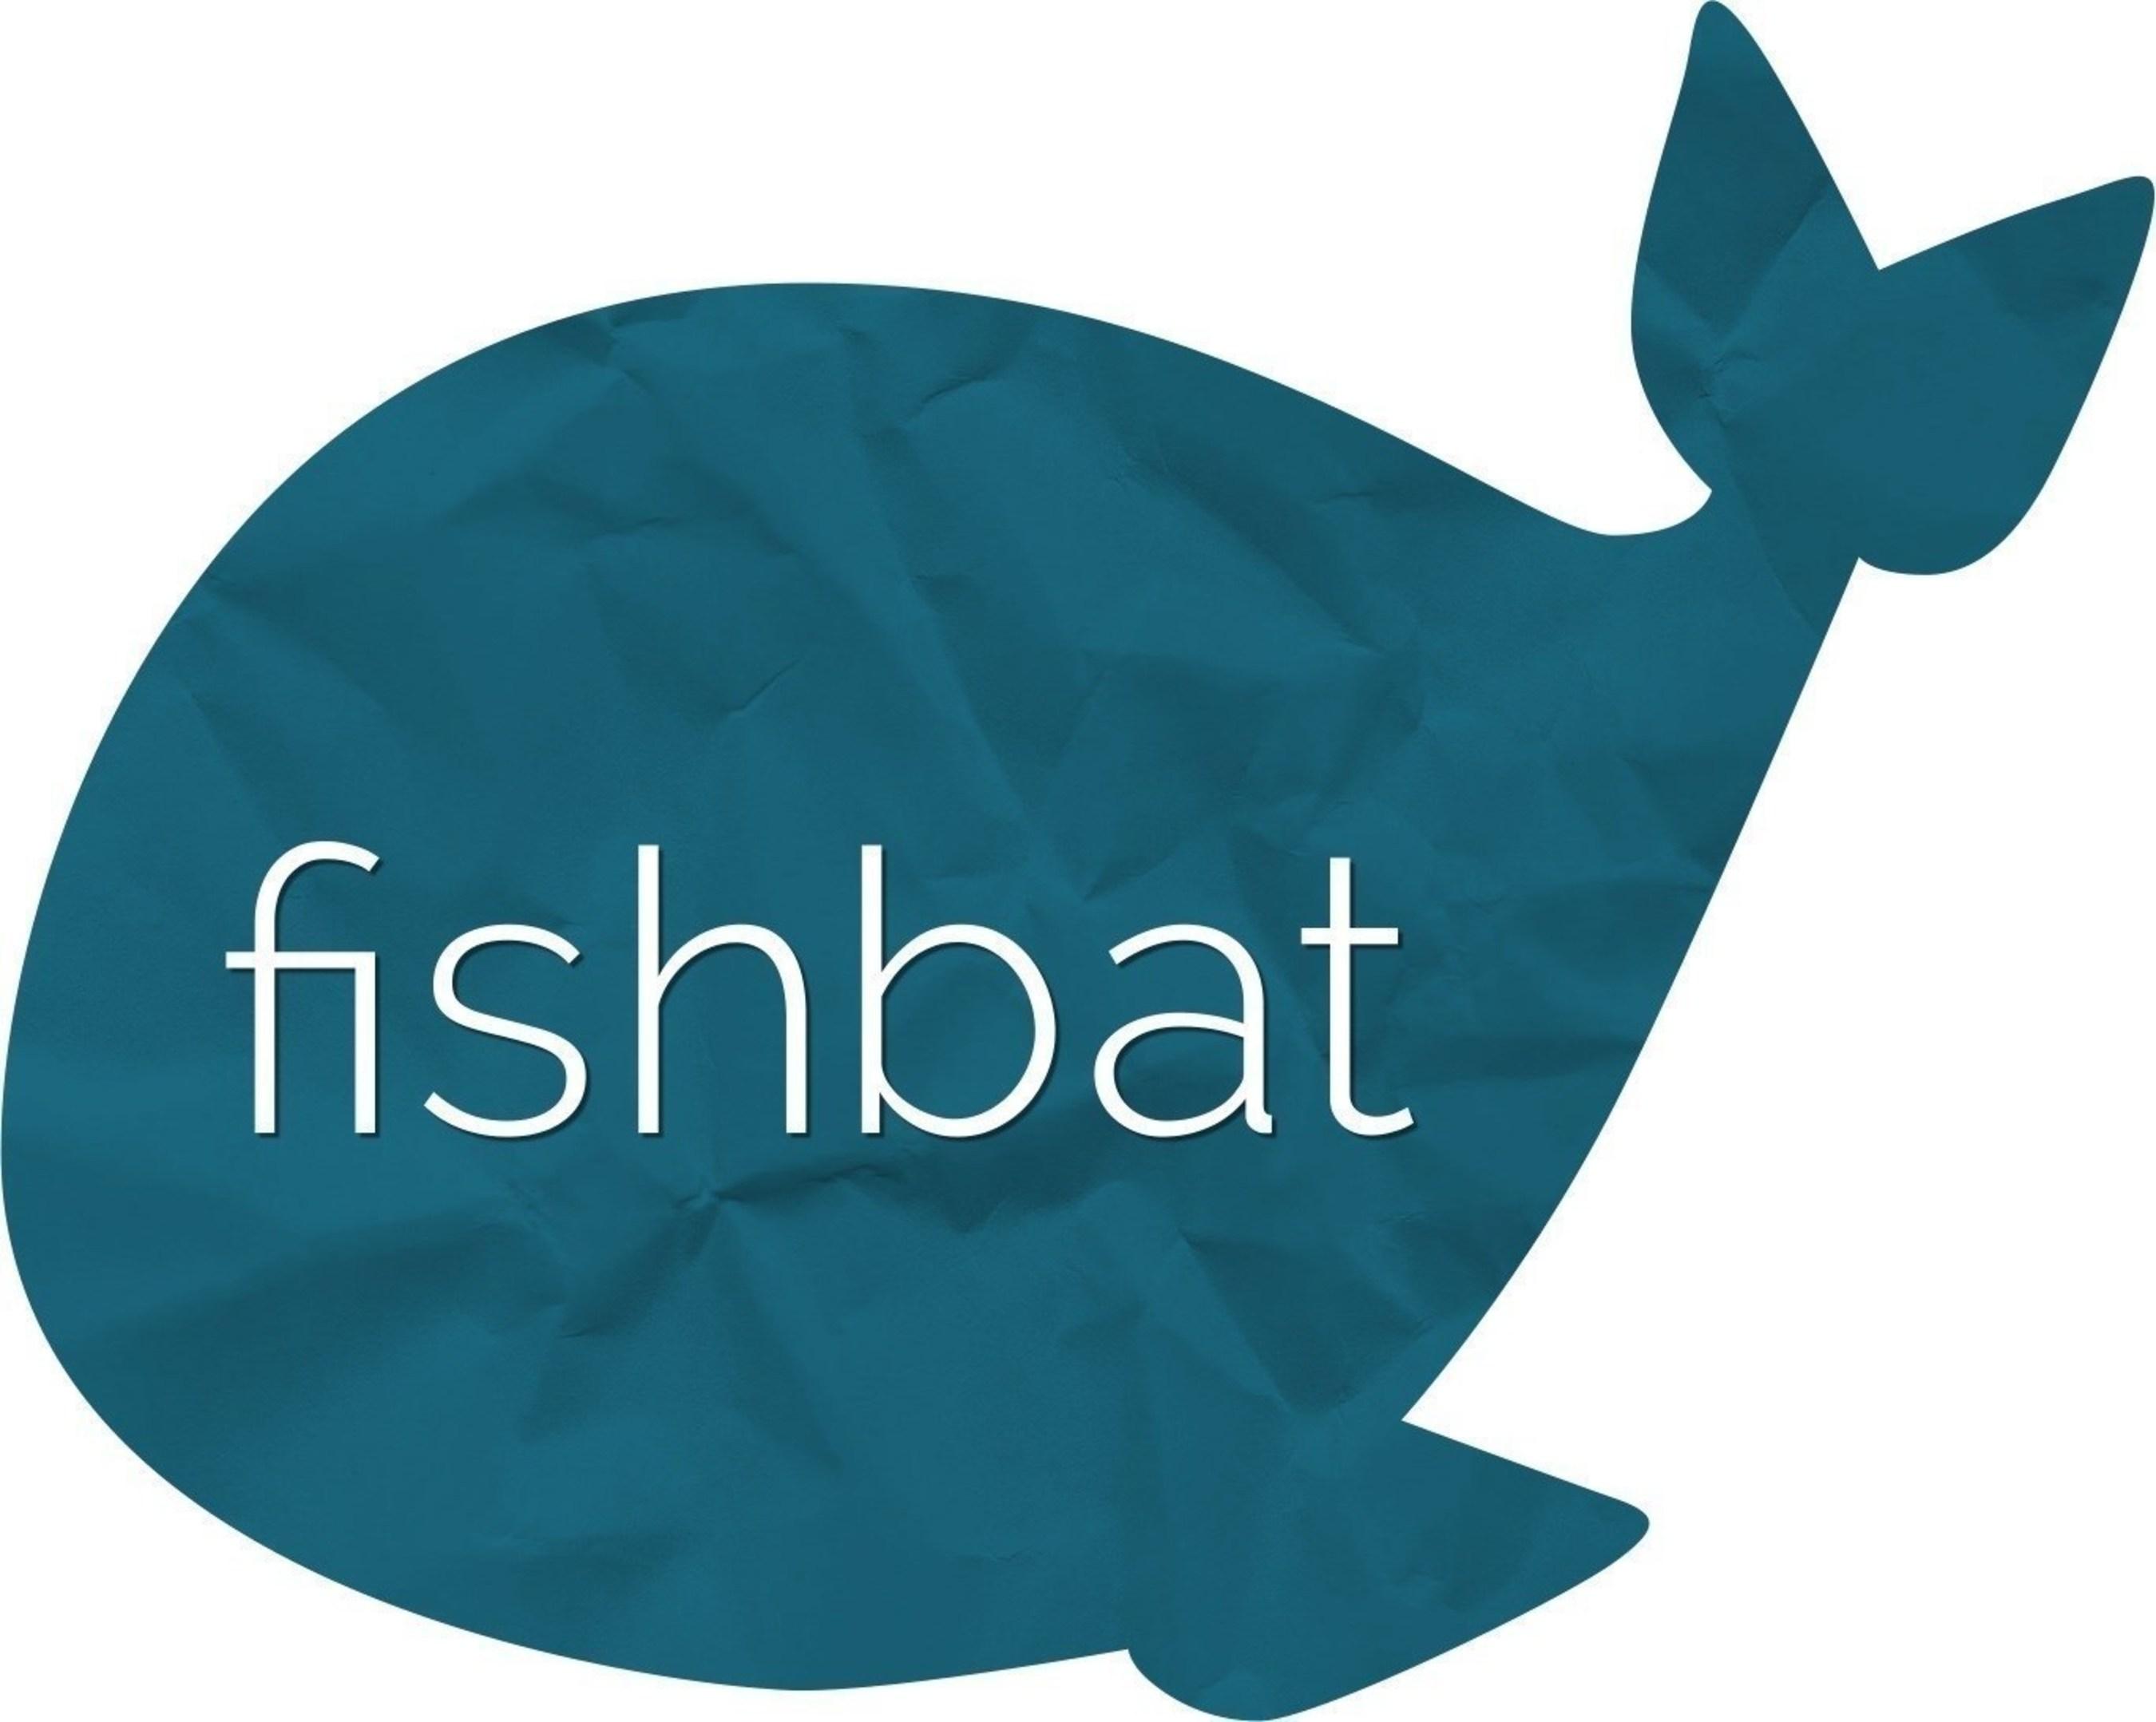 Internet Marketing Company, fishbat, Lists 3 LinkedIn Updates That Encourage User Outreach